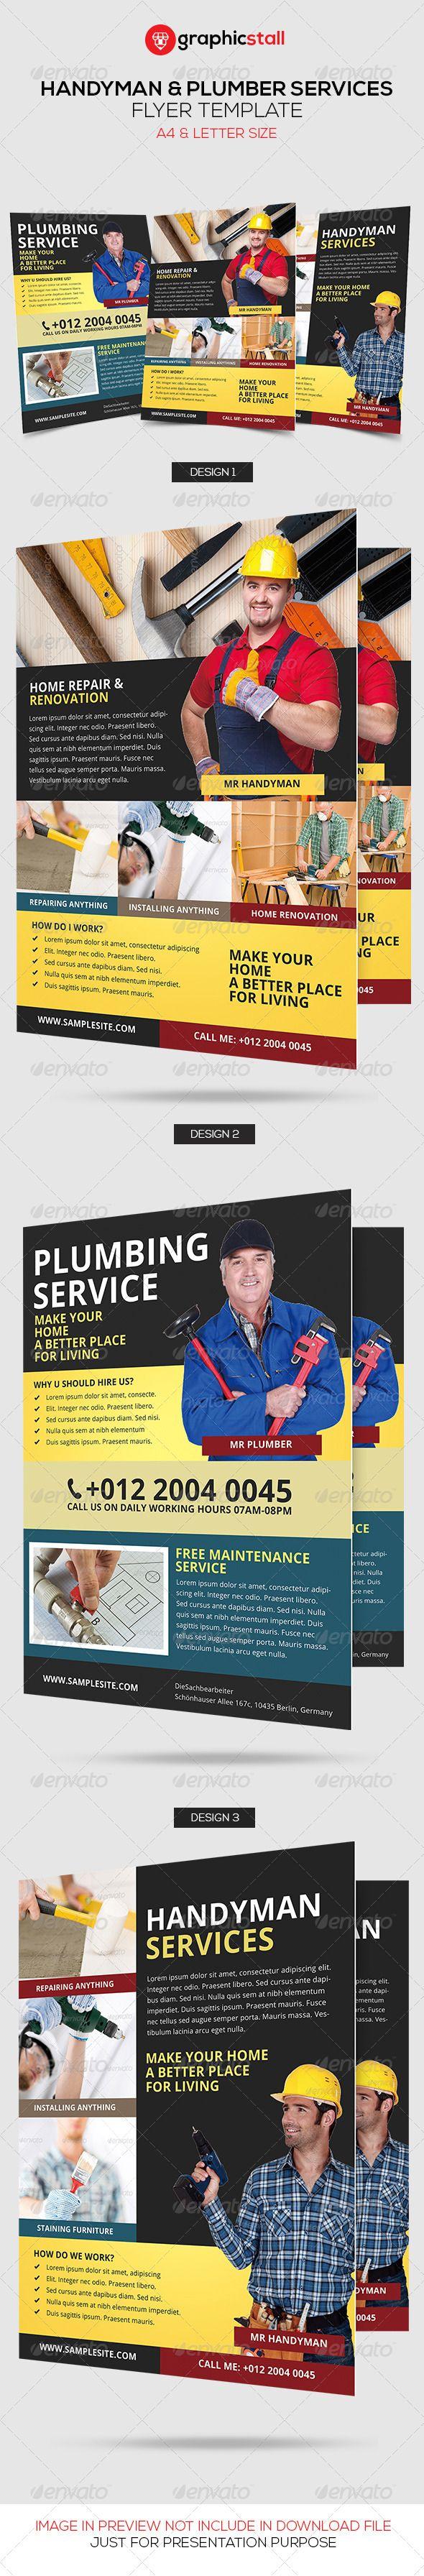 Handyman & Plumber Services Flyer - Corporate Flyers | Download http://graphicriver.net/item/handyman-plumber-services-flyer/6745676?ref=sinzo